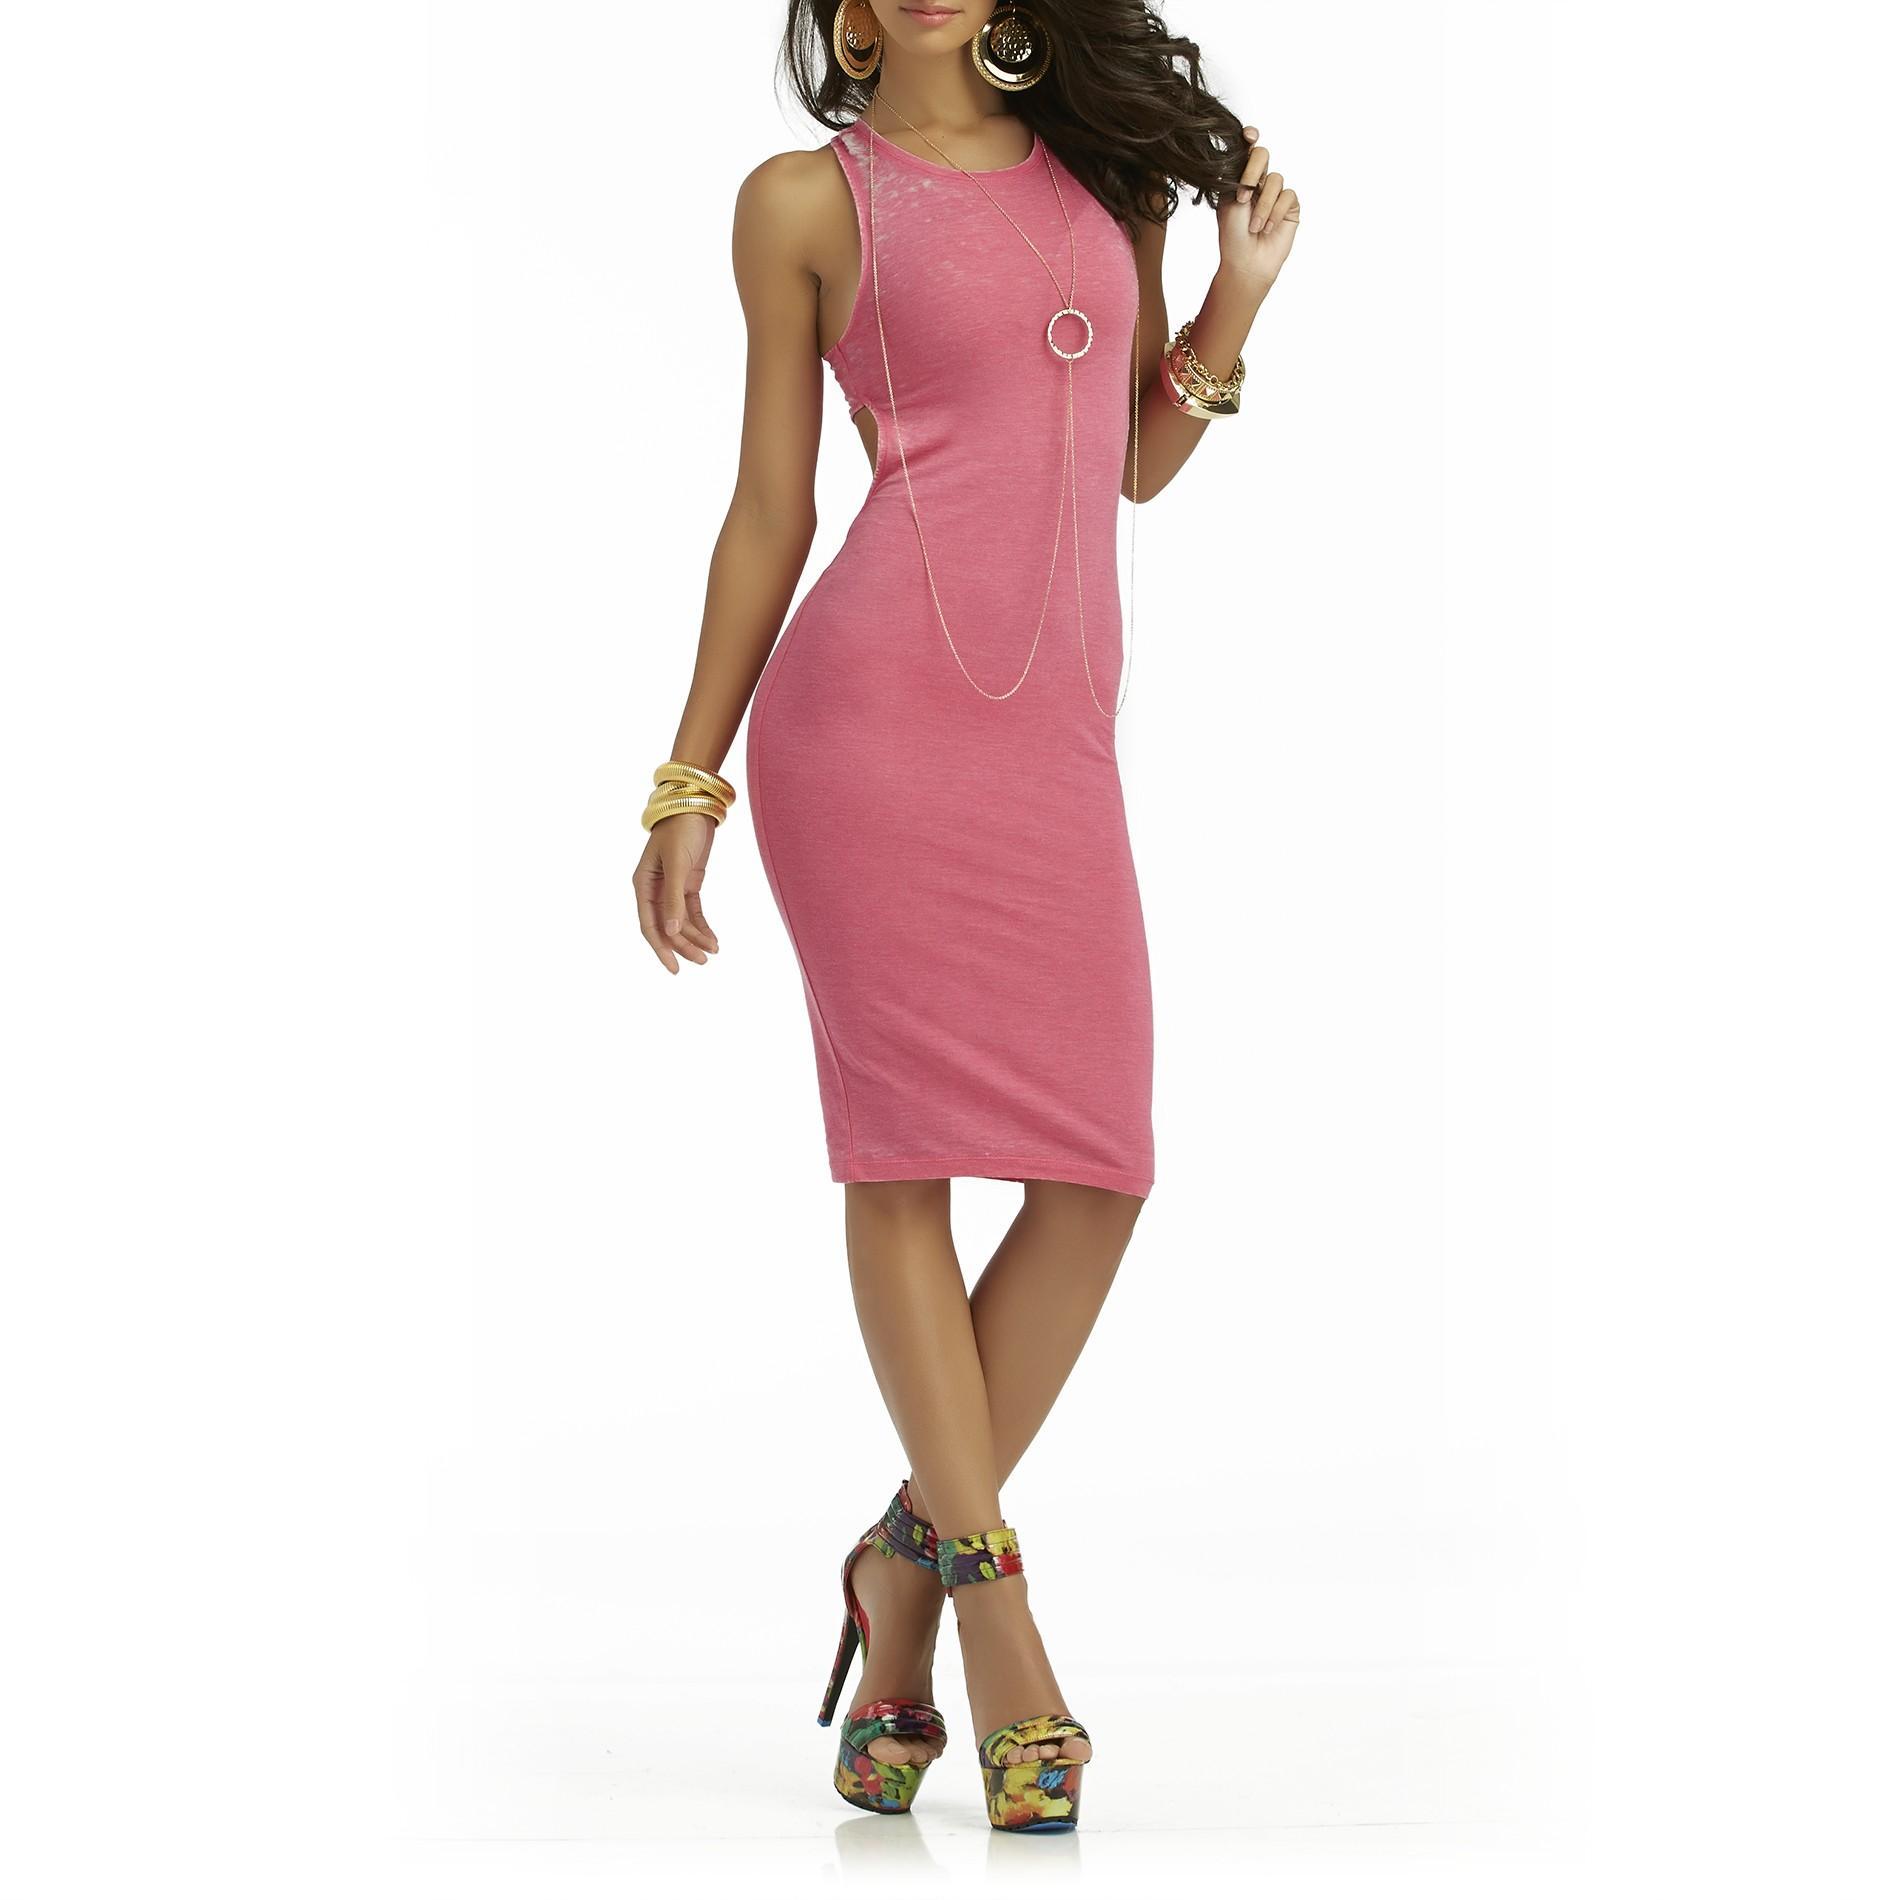 Nicki Minaj Women's Burnout Tank Dress at Kmart.com